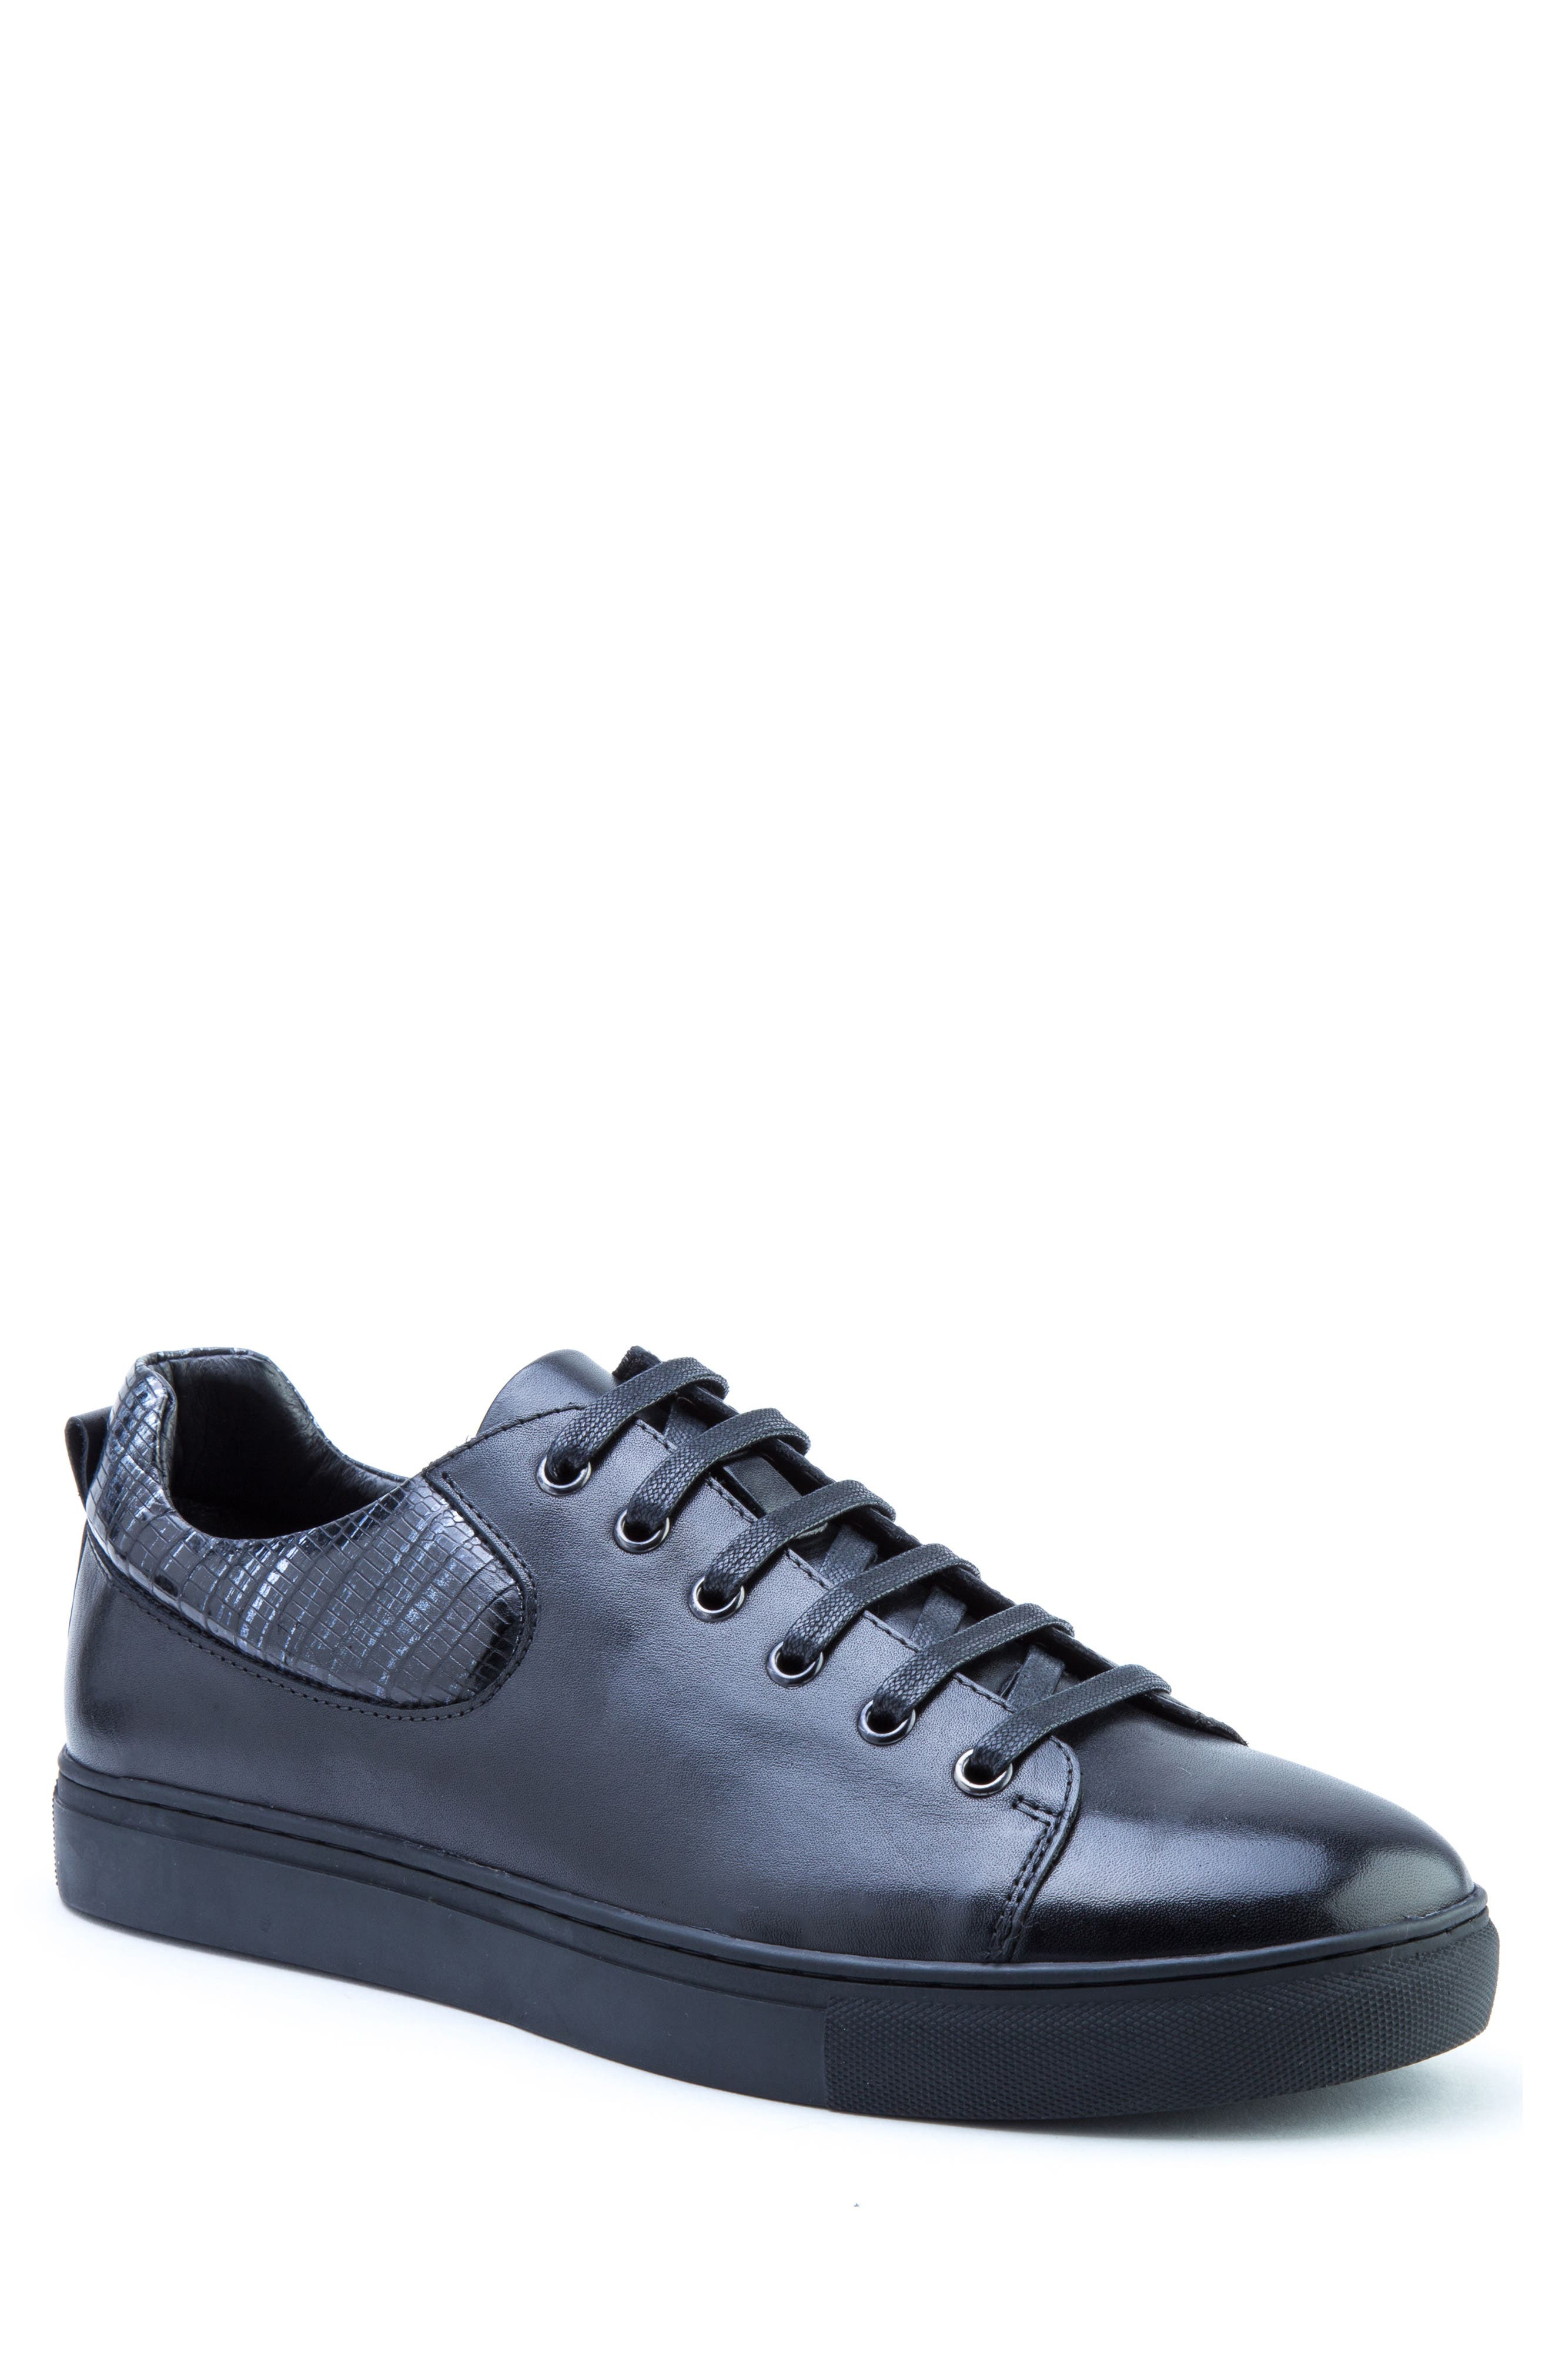 Robinson Sneaker,                         Main,                         color, Black Leather